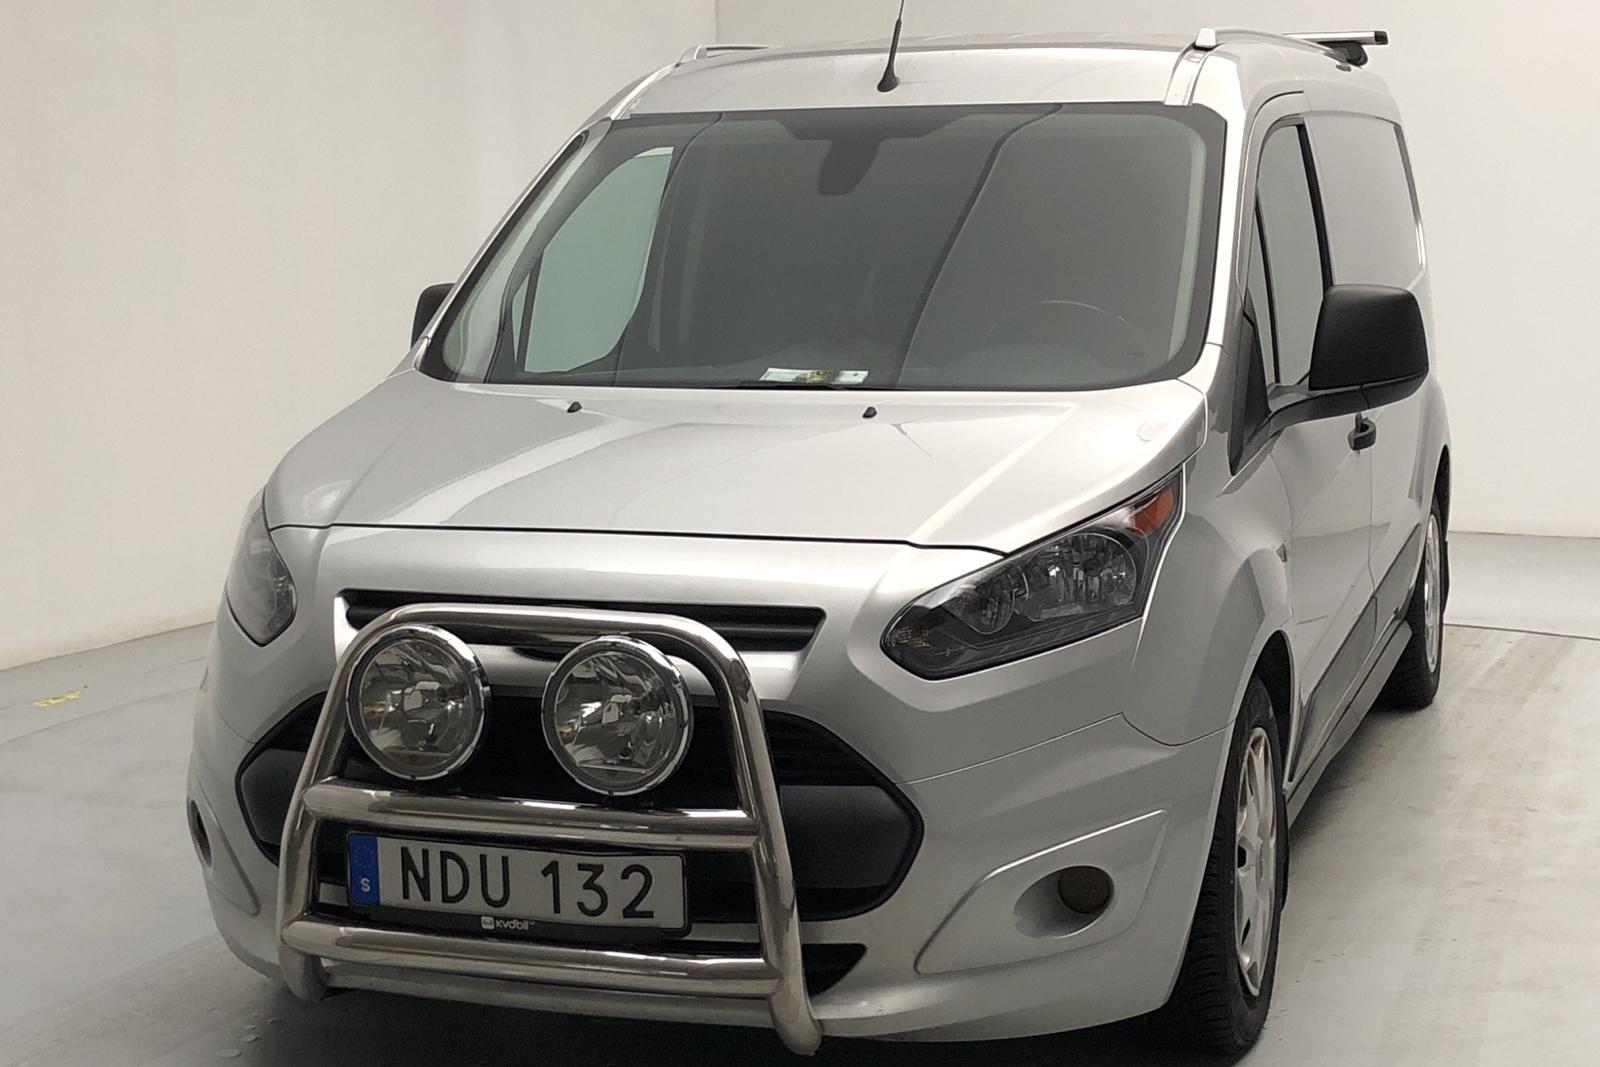 Ford Transit Connect 1.5 TDCi (100hk) - 83 880 km - Manual - gray - 2016